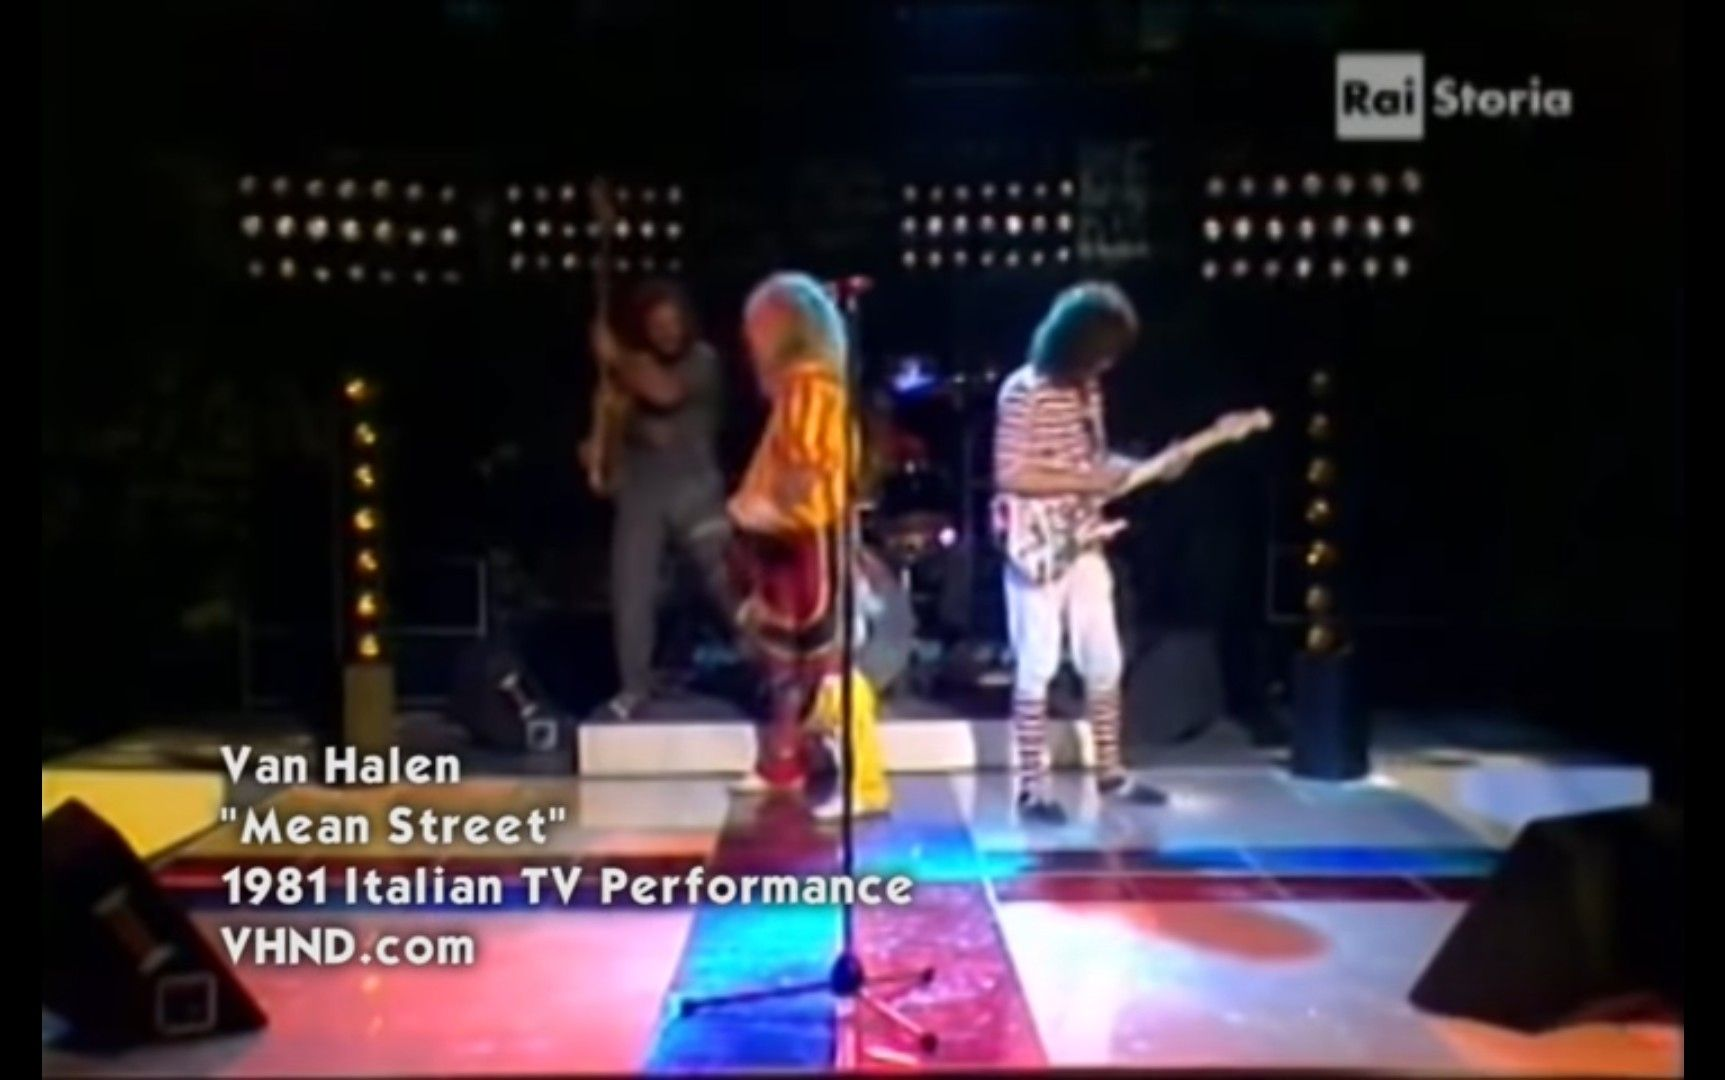 Pin By Bob Watson On Vid Pixz In 2020 Van Halen Videos Van Halen Halen